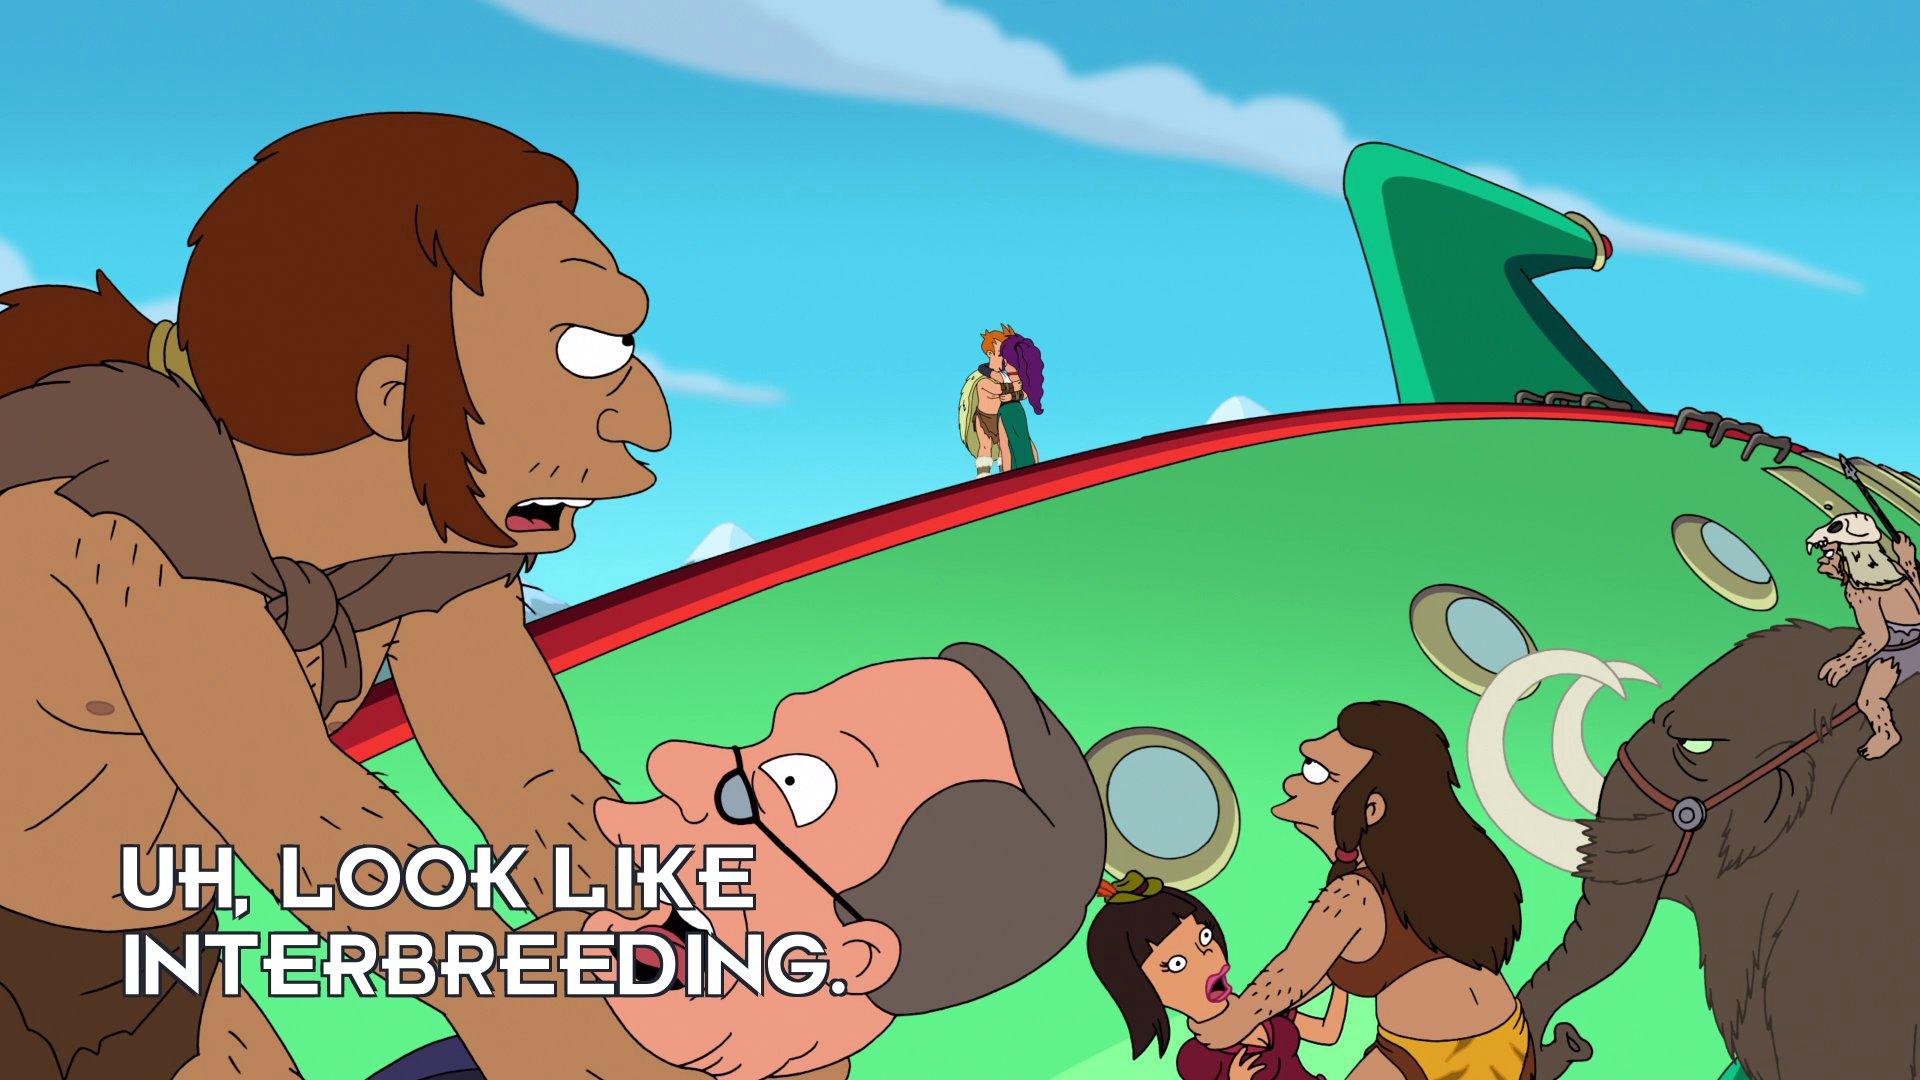 Neanderthal 2: Uh, look like interbreeding.